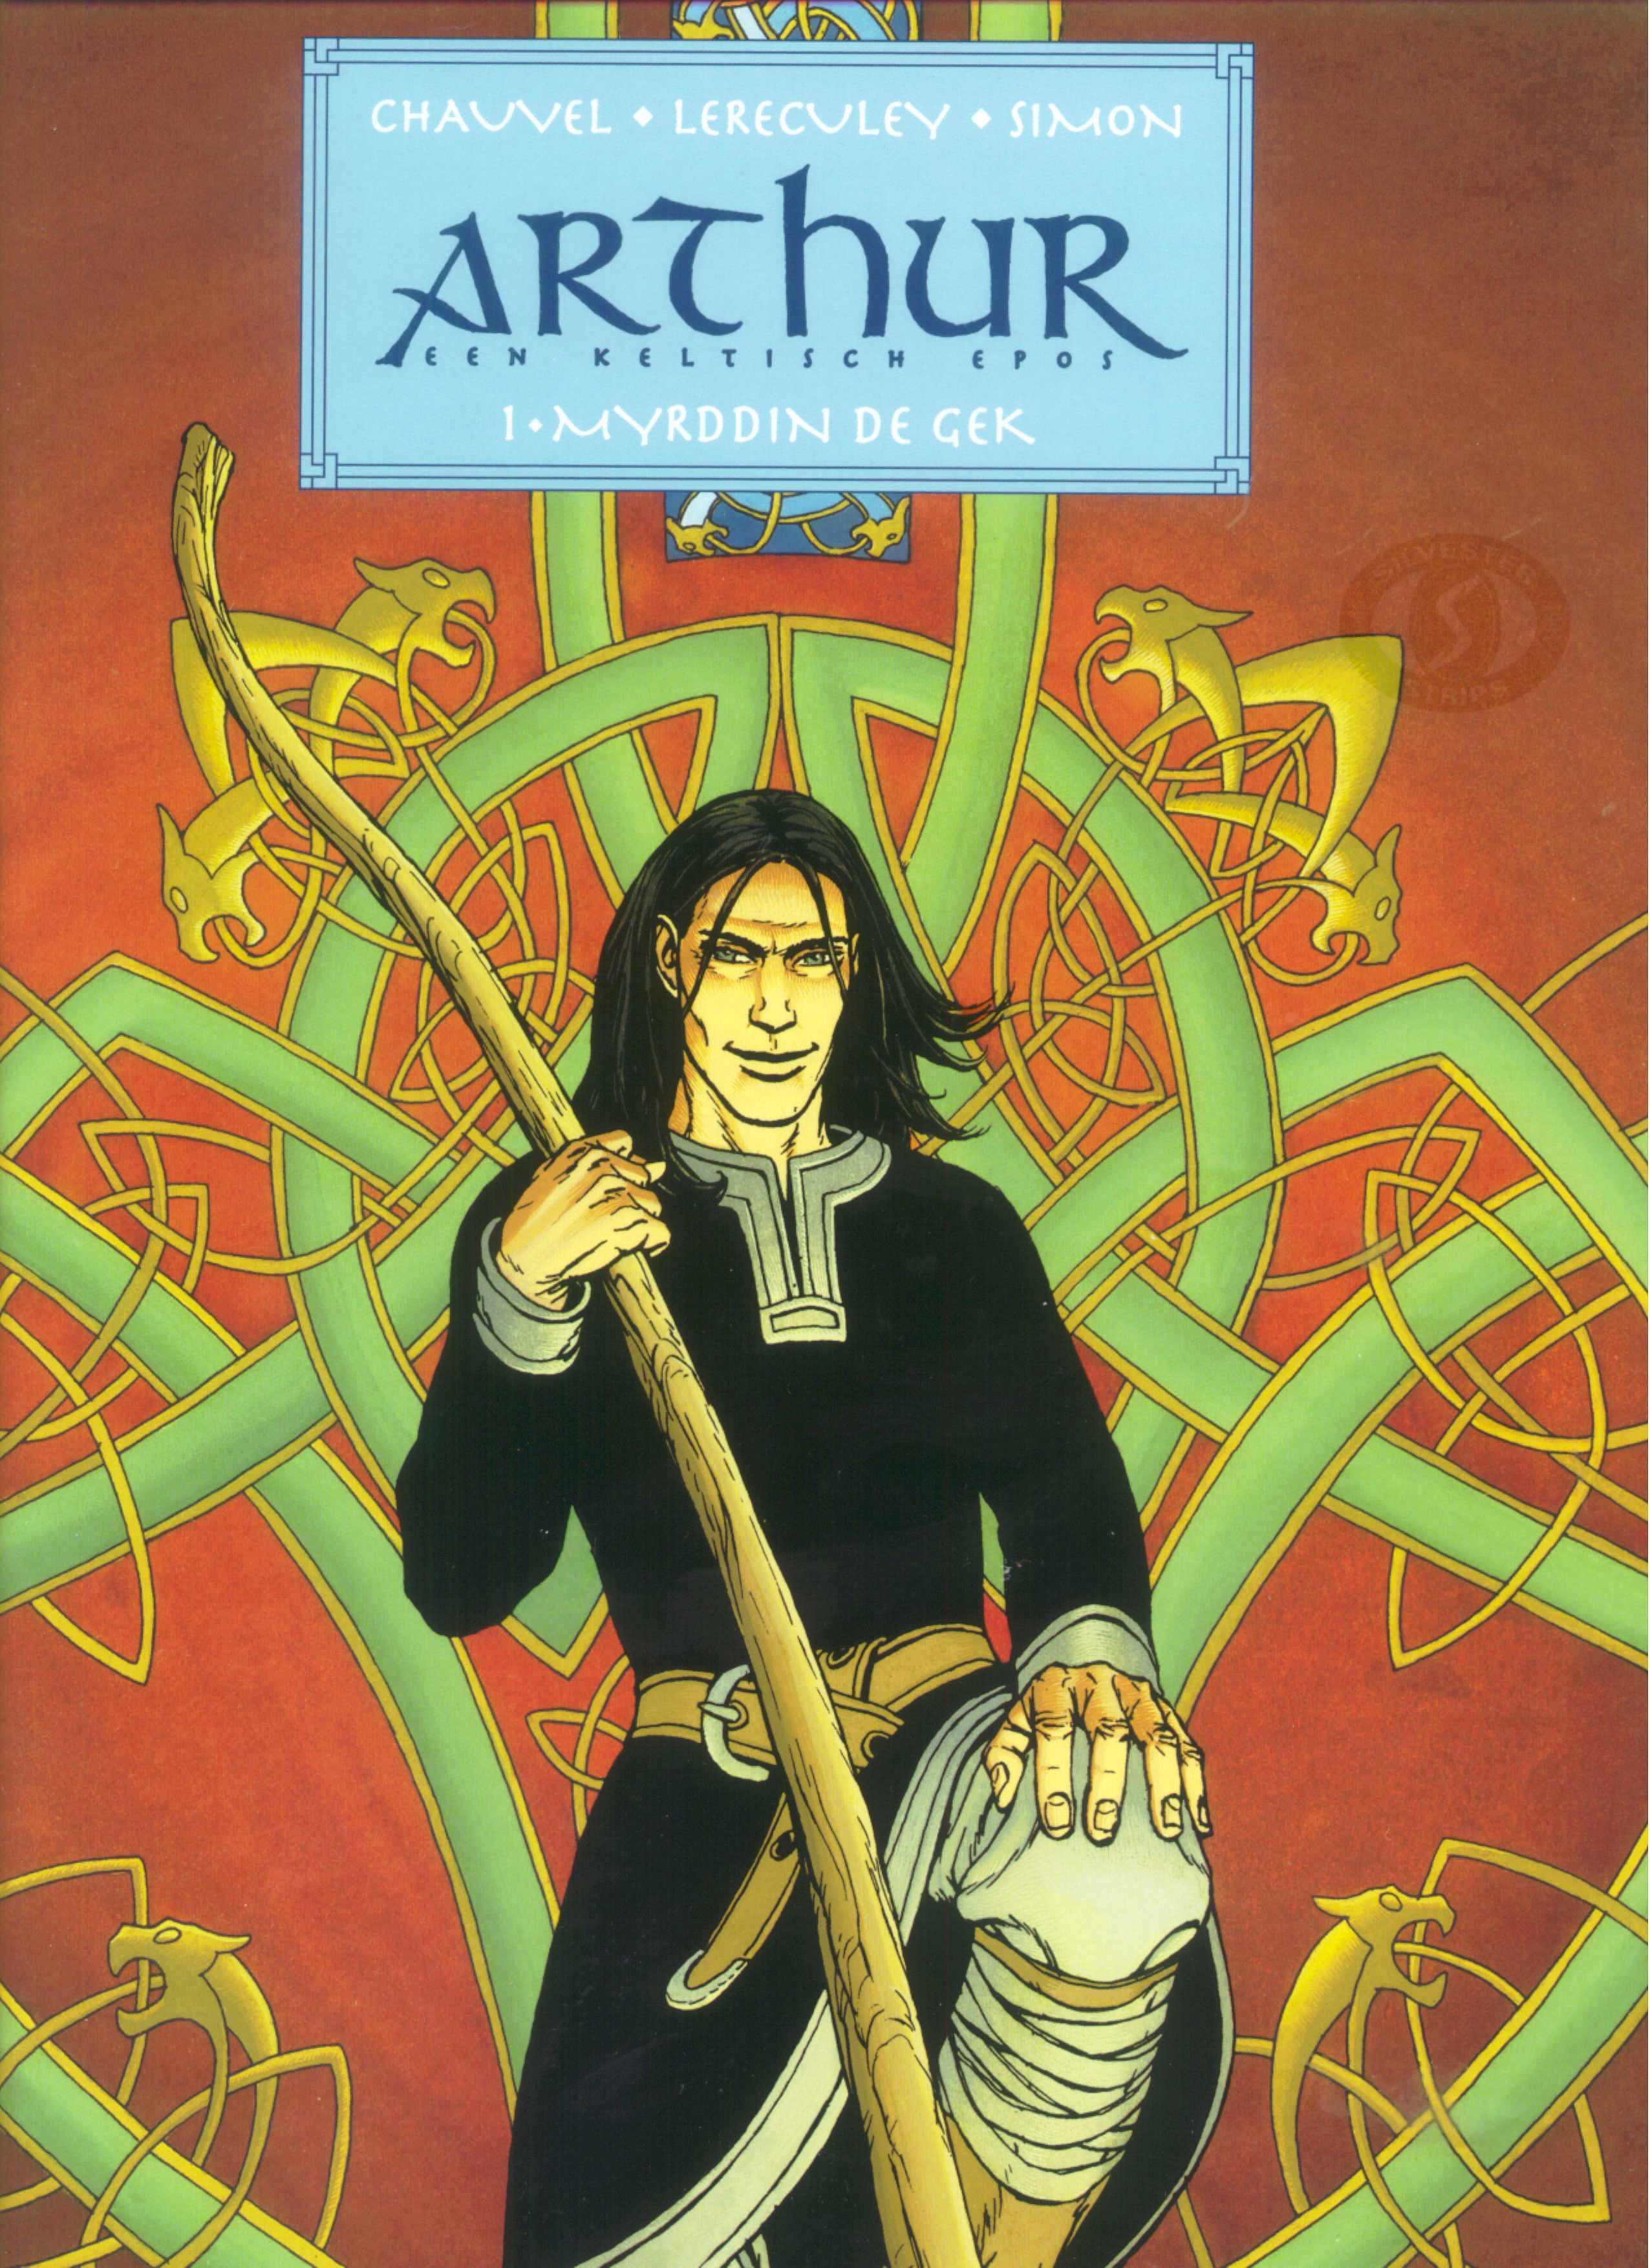 Arthur (Een Keltisch Epos)/Arthur (Een Keltisch Epos) - 08 - Gwenhwyfar de strijdster